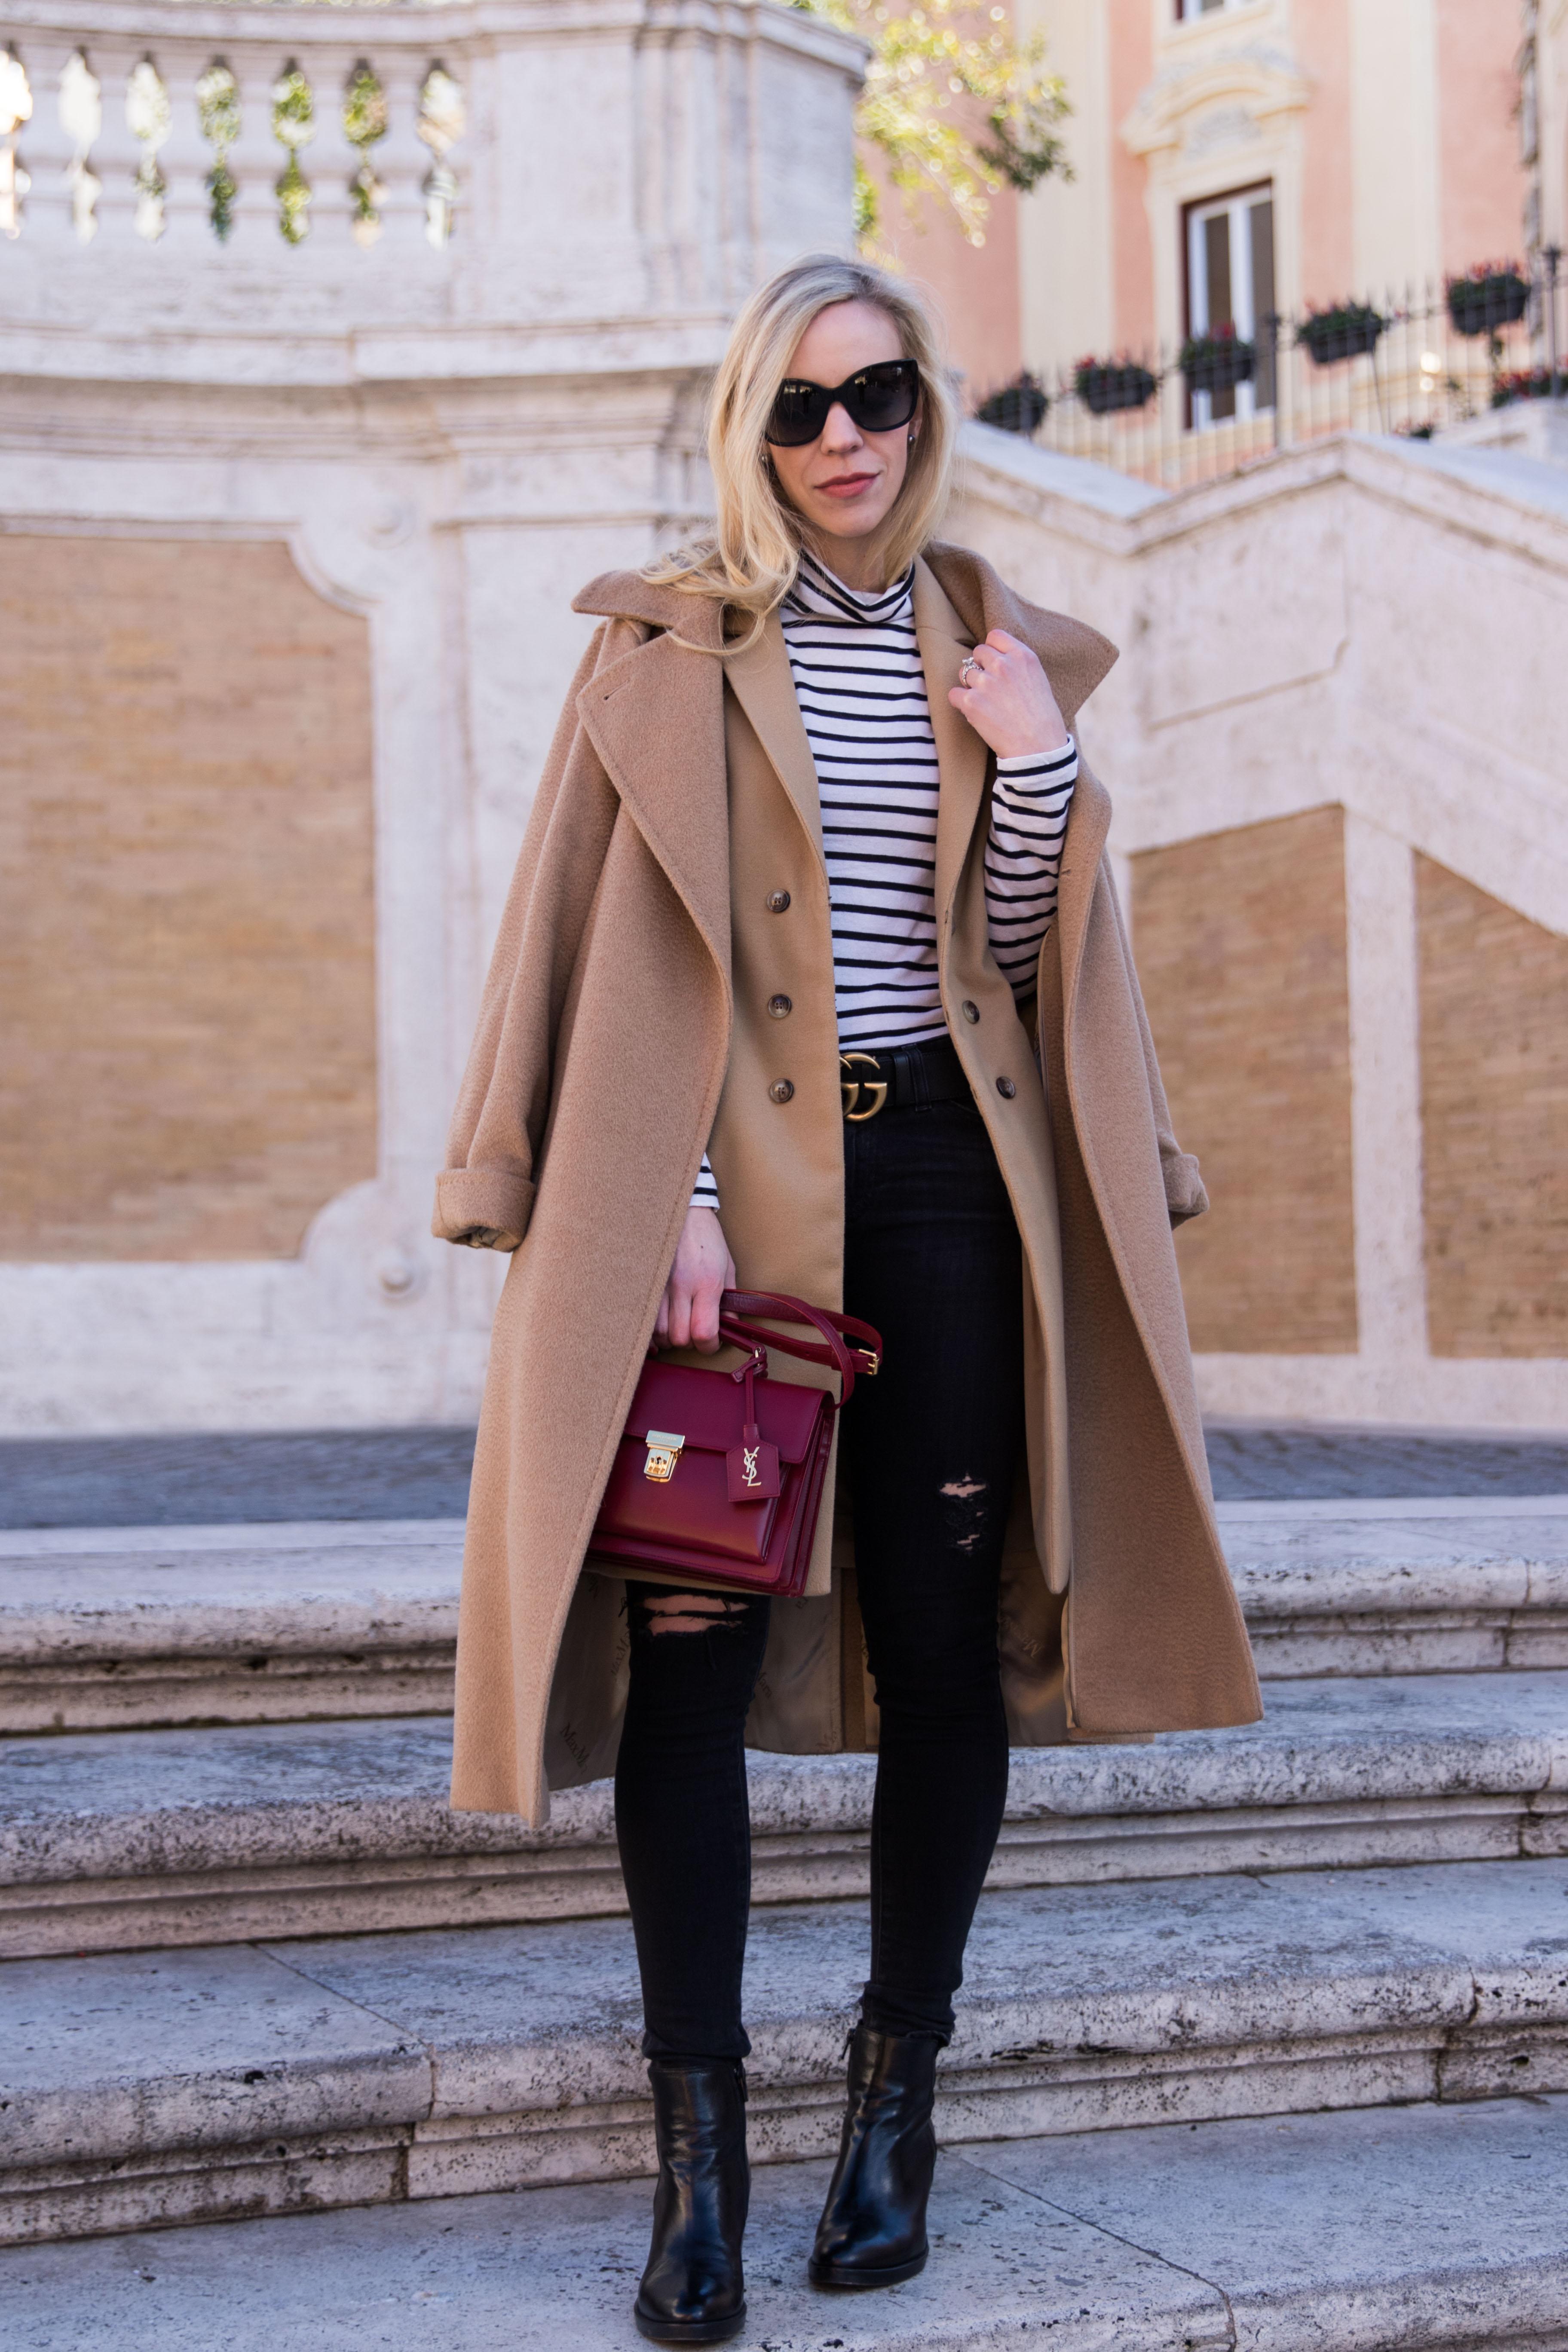 fashion blogger Meagan Brandon wearing Max Mara Manuela camel coat with striped turtleneck and black jeans, Saint Laurent red High School bag